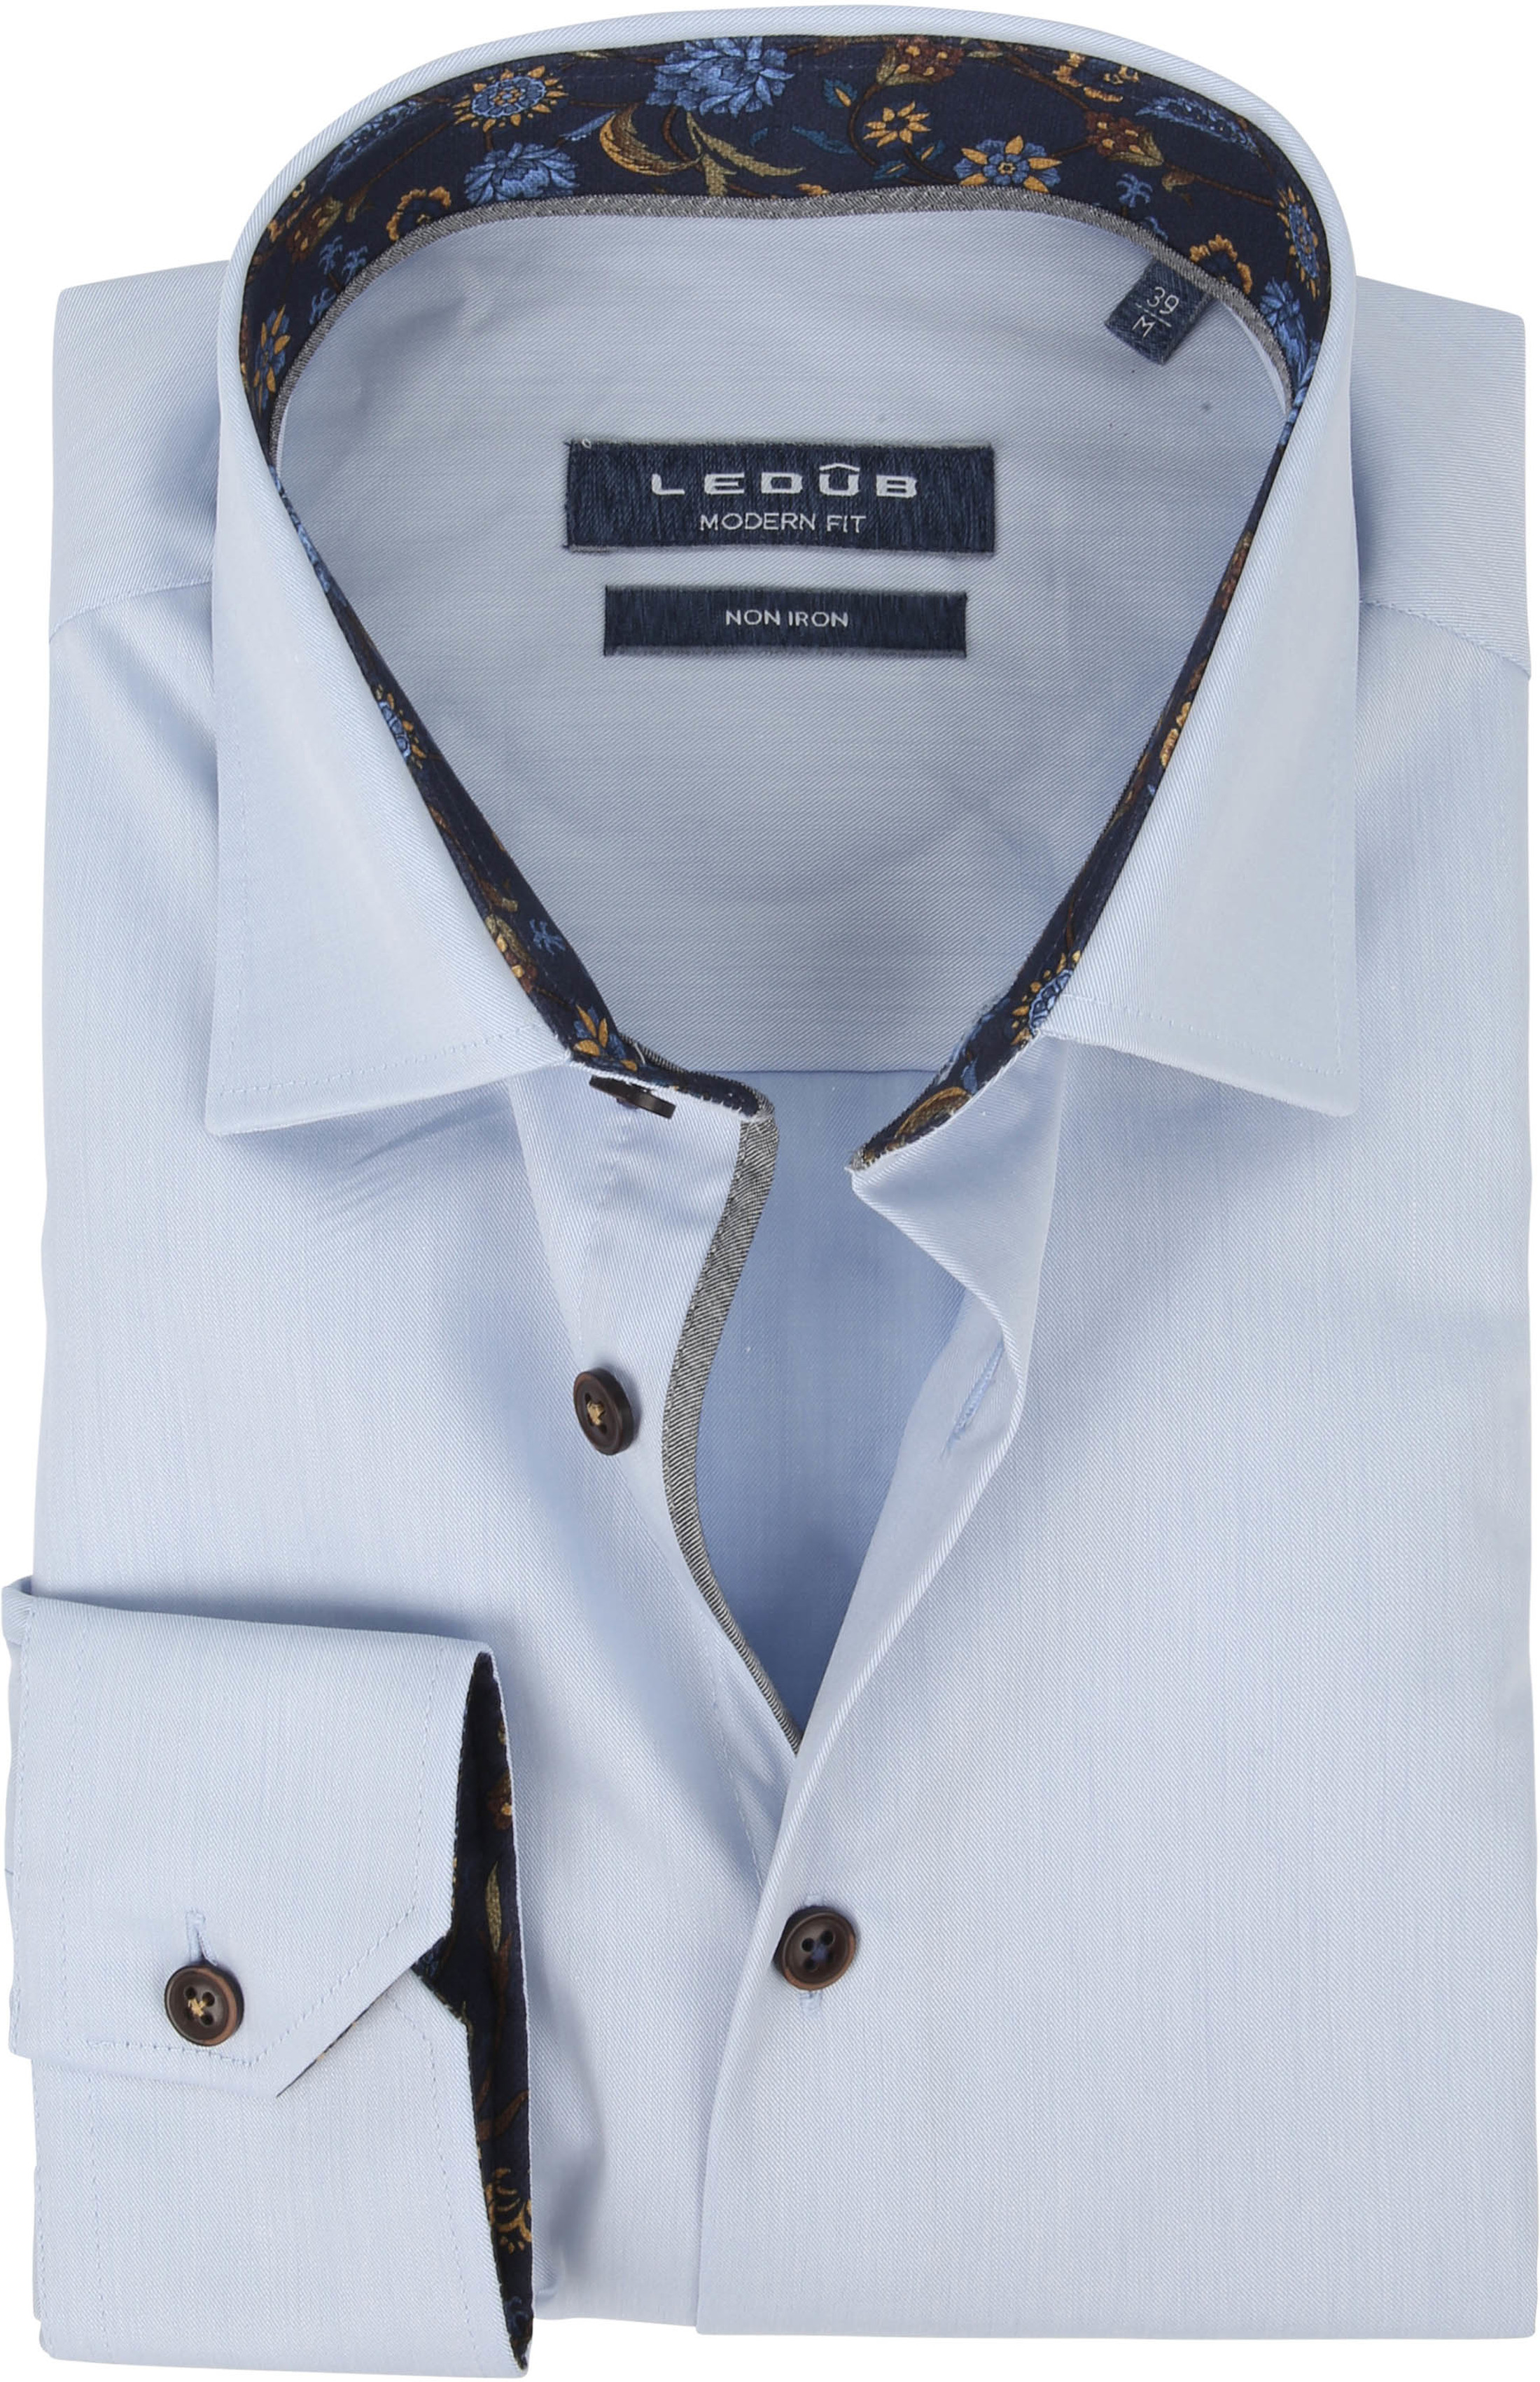 Ledub Shirt Non Iron Blauw Flowers